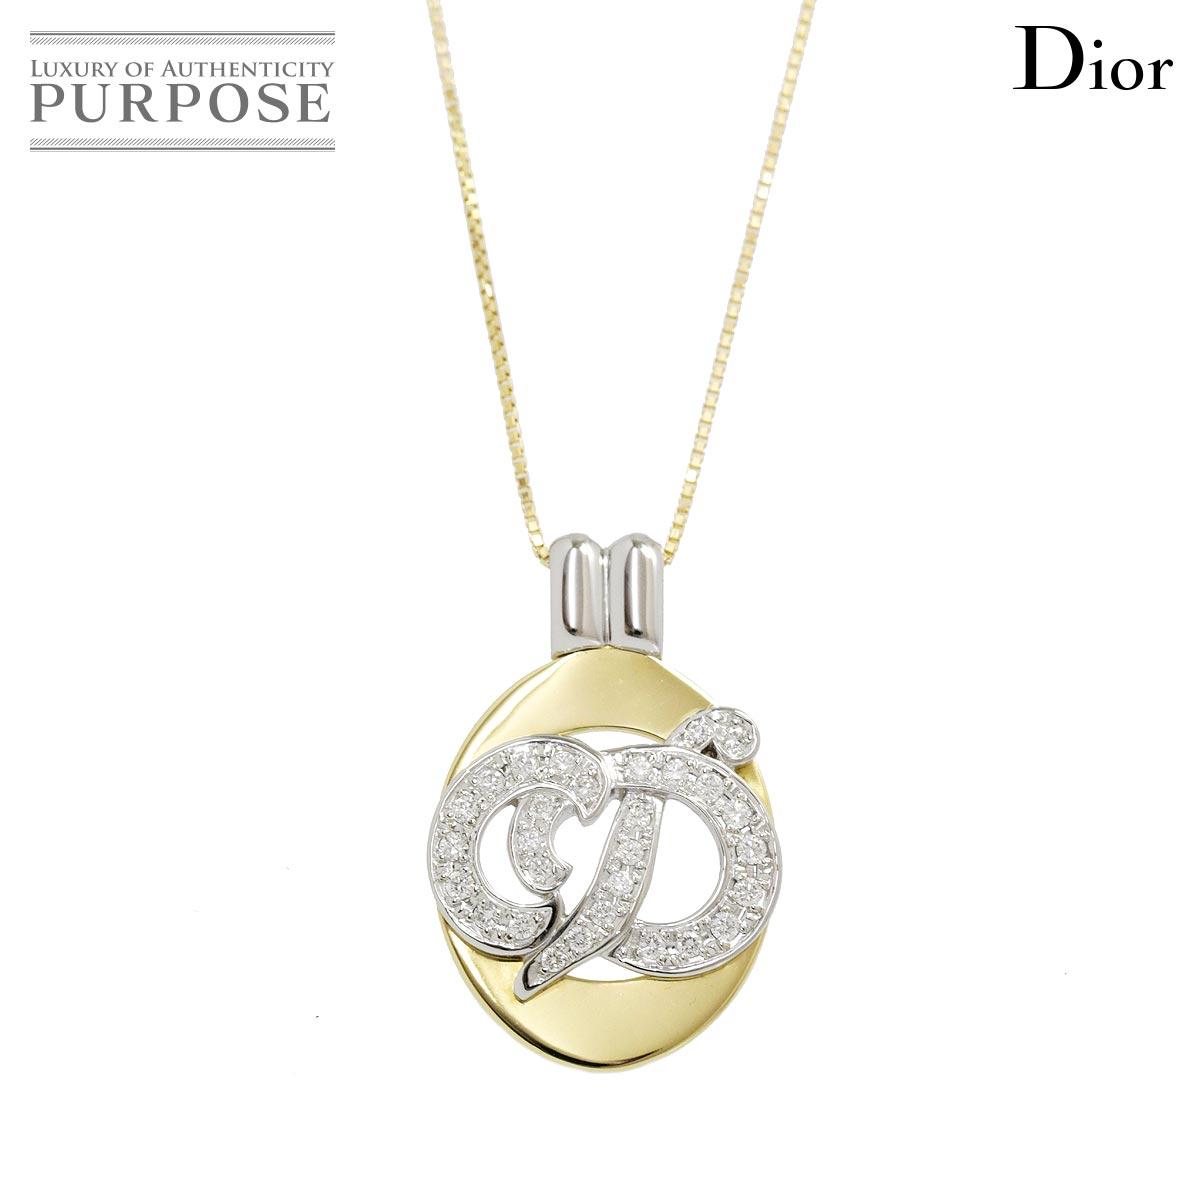 Dior K18YG/WG ロゴ Christian ディオール 18金 45cm ダイヤ 【新品仕上げ】 750 クリスチャン 【中古】 ネックレス